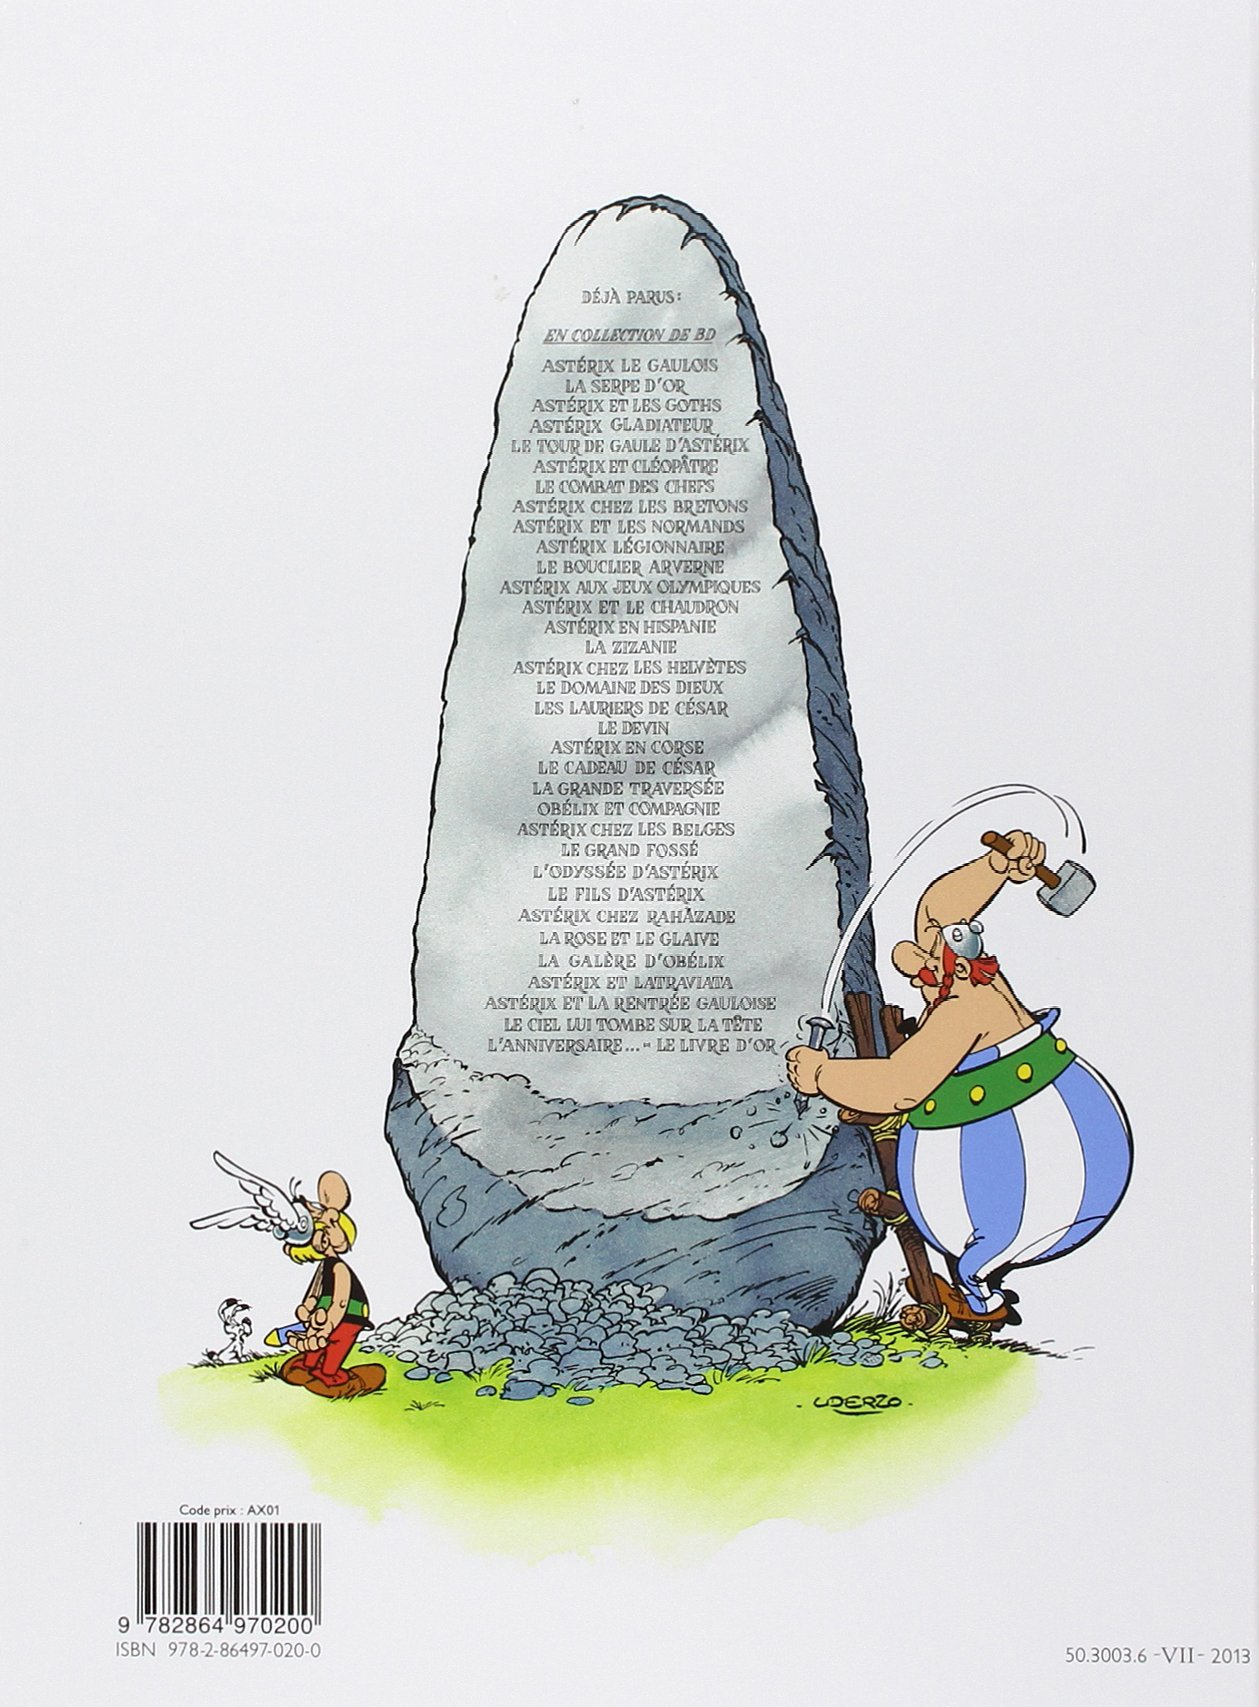 Astérix - chez Rahazade - n°28 (Asterix) by Brand: Hodder Children's Books